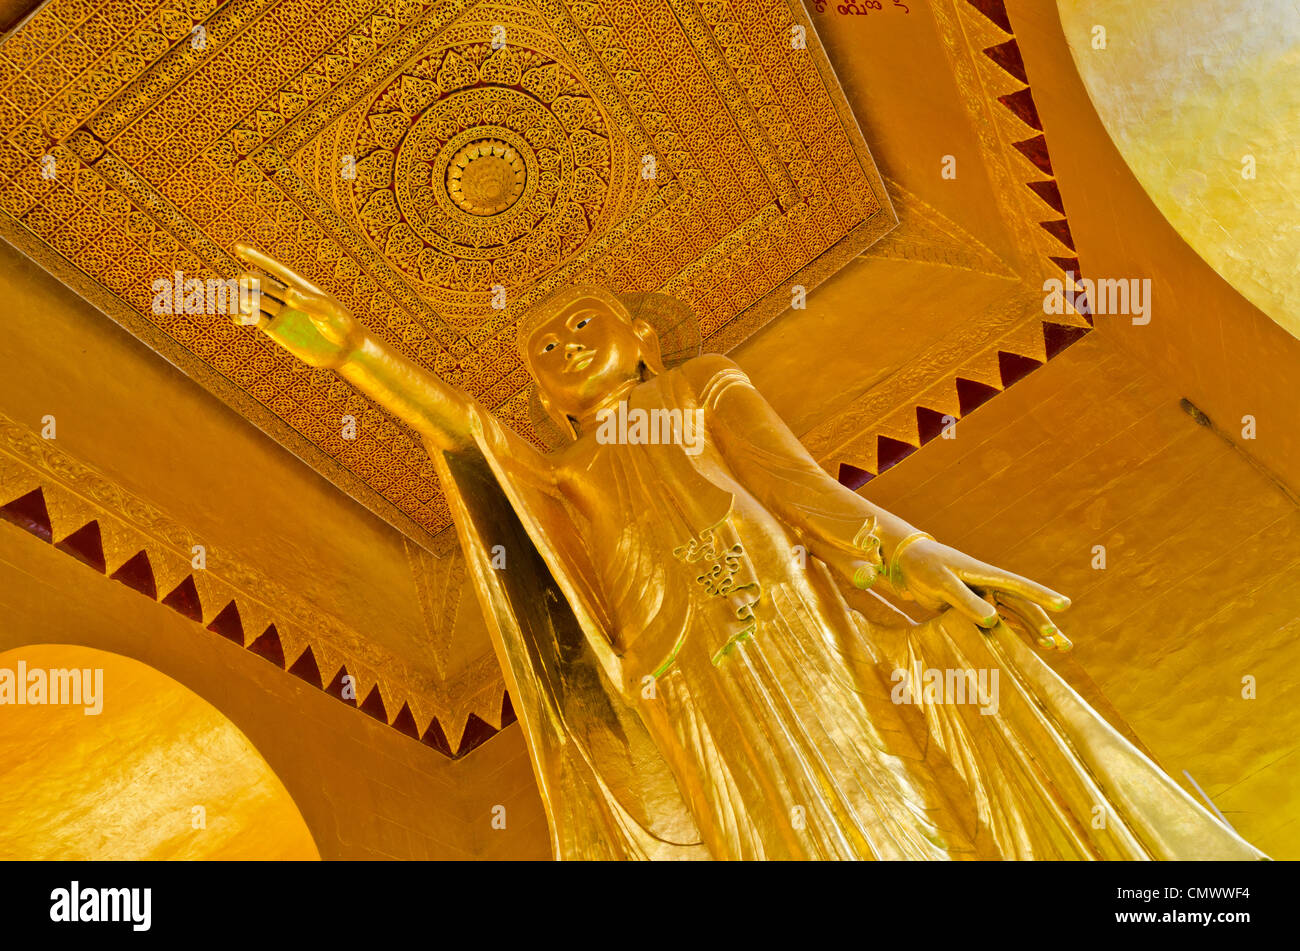 Buddha statue, Mandalay Hill, Mandalay, Myanmar - Stock Image